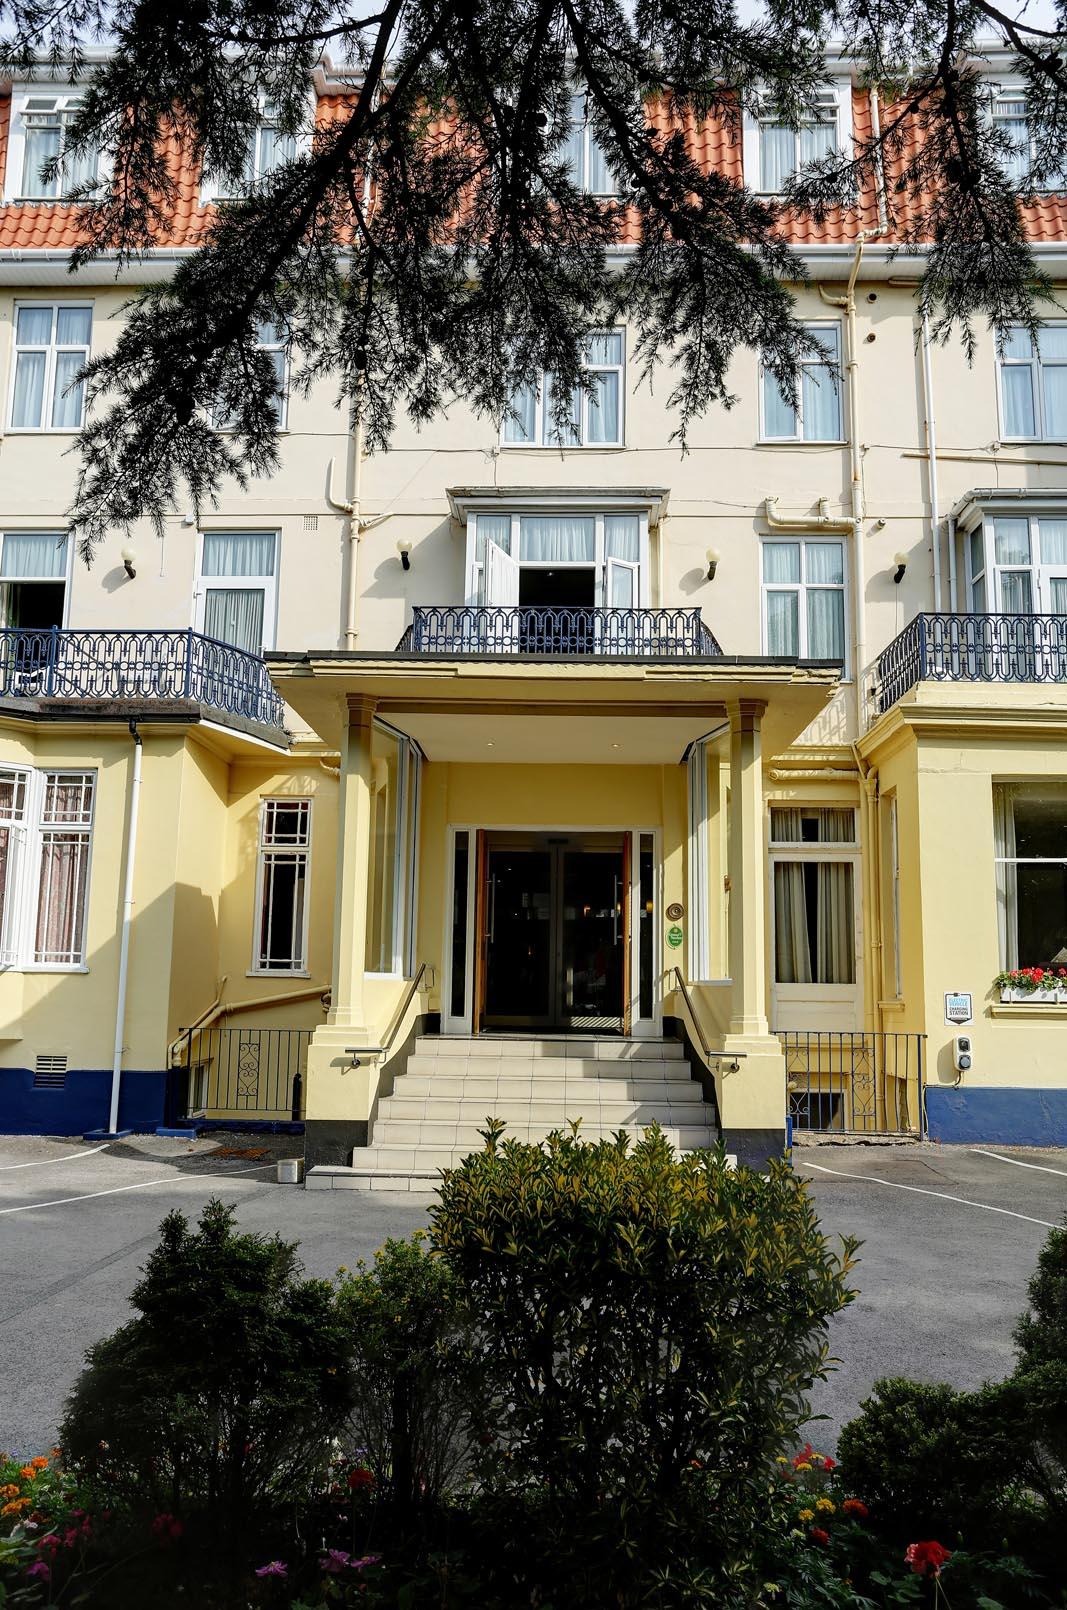 Best Western Hotel Room: Hotels In Bournemouth, Dorset